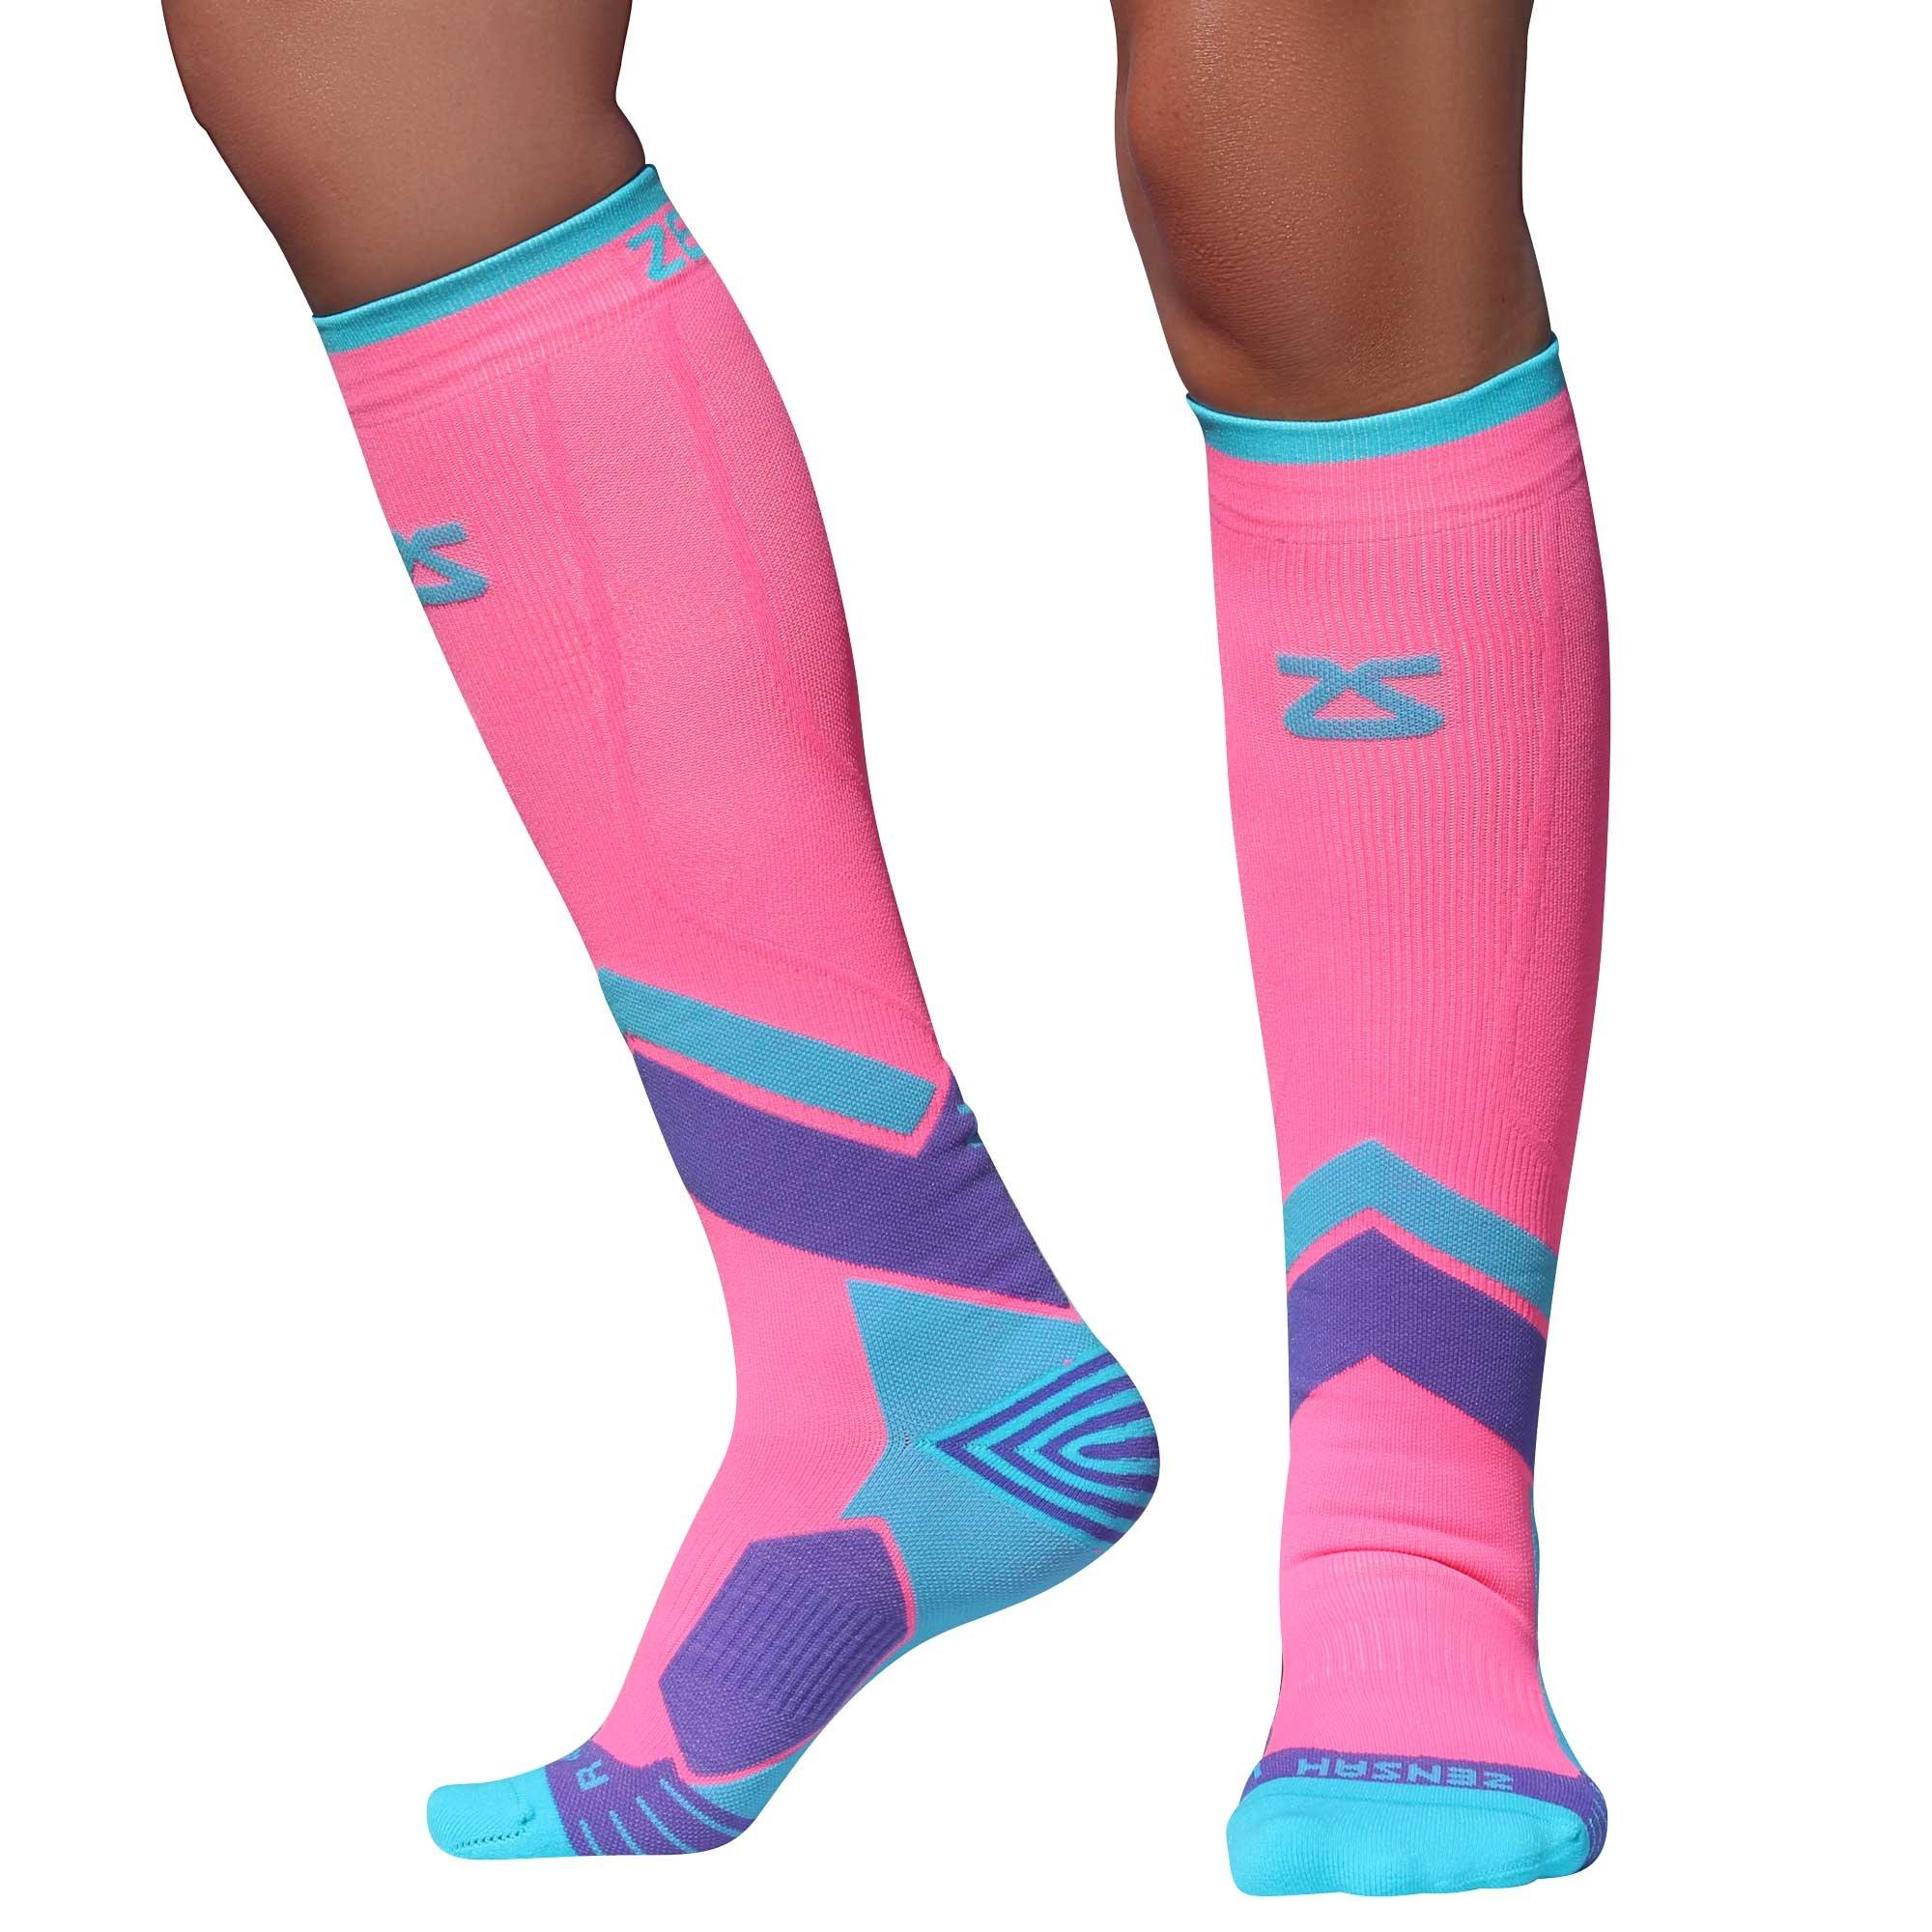 Zensah Pop Tech+ Compression Graduated Compression Socks, Coral/Mint/Purple, Small